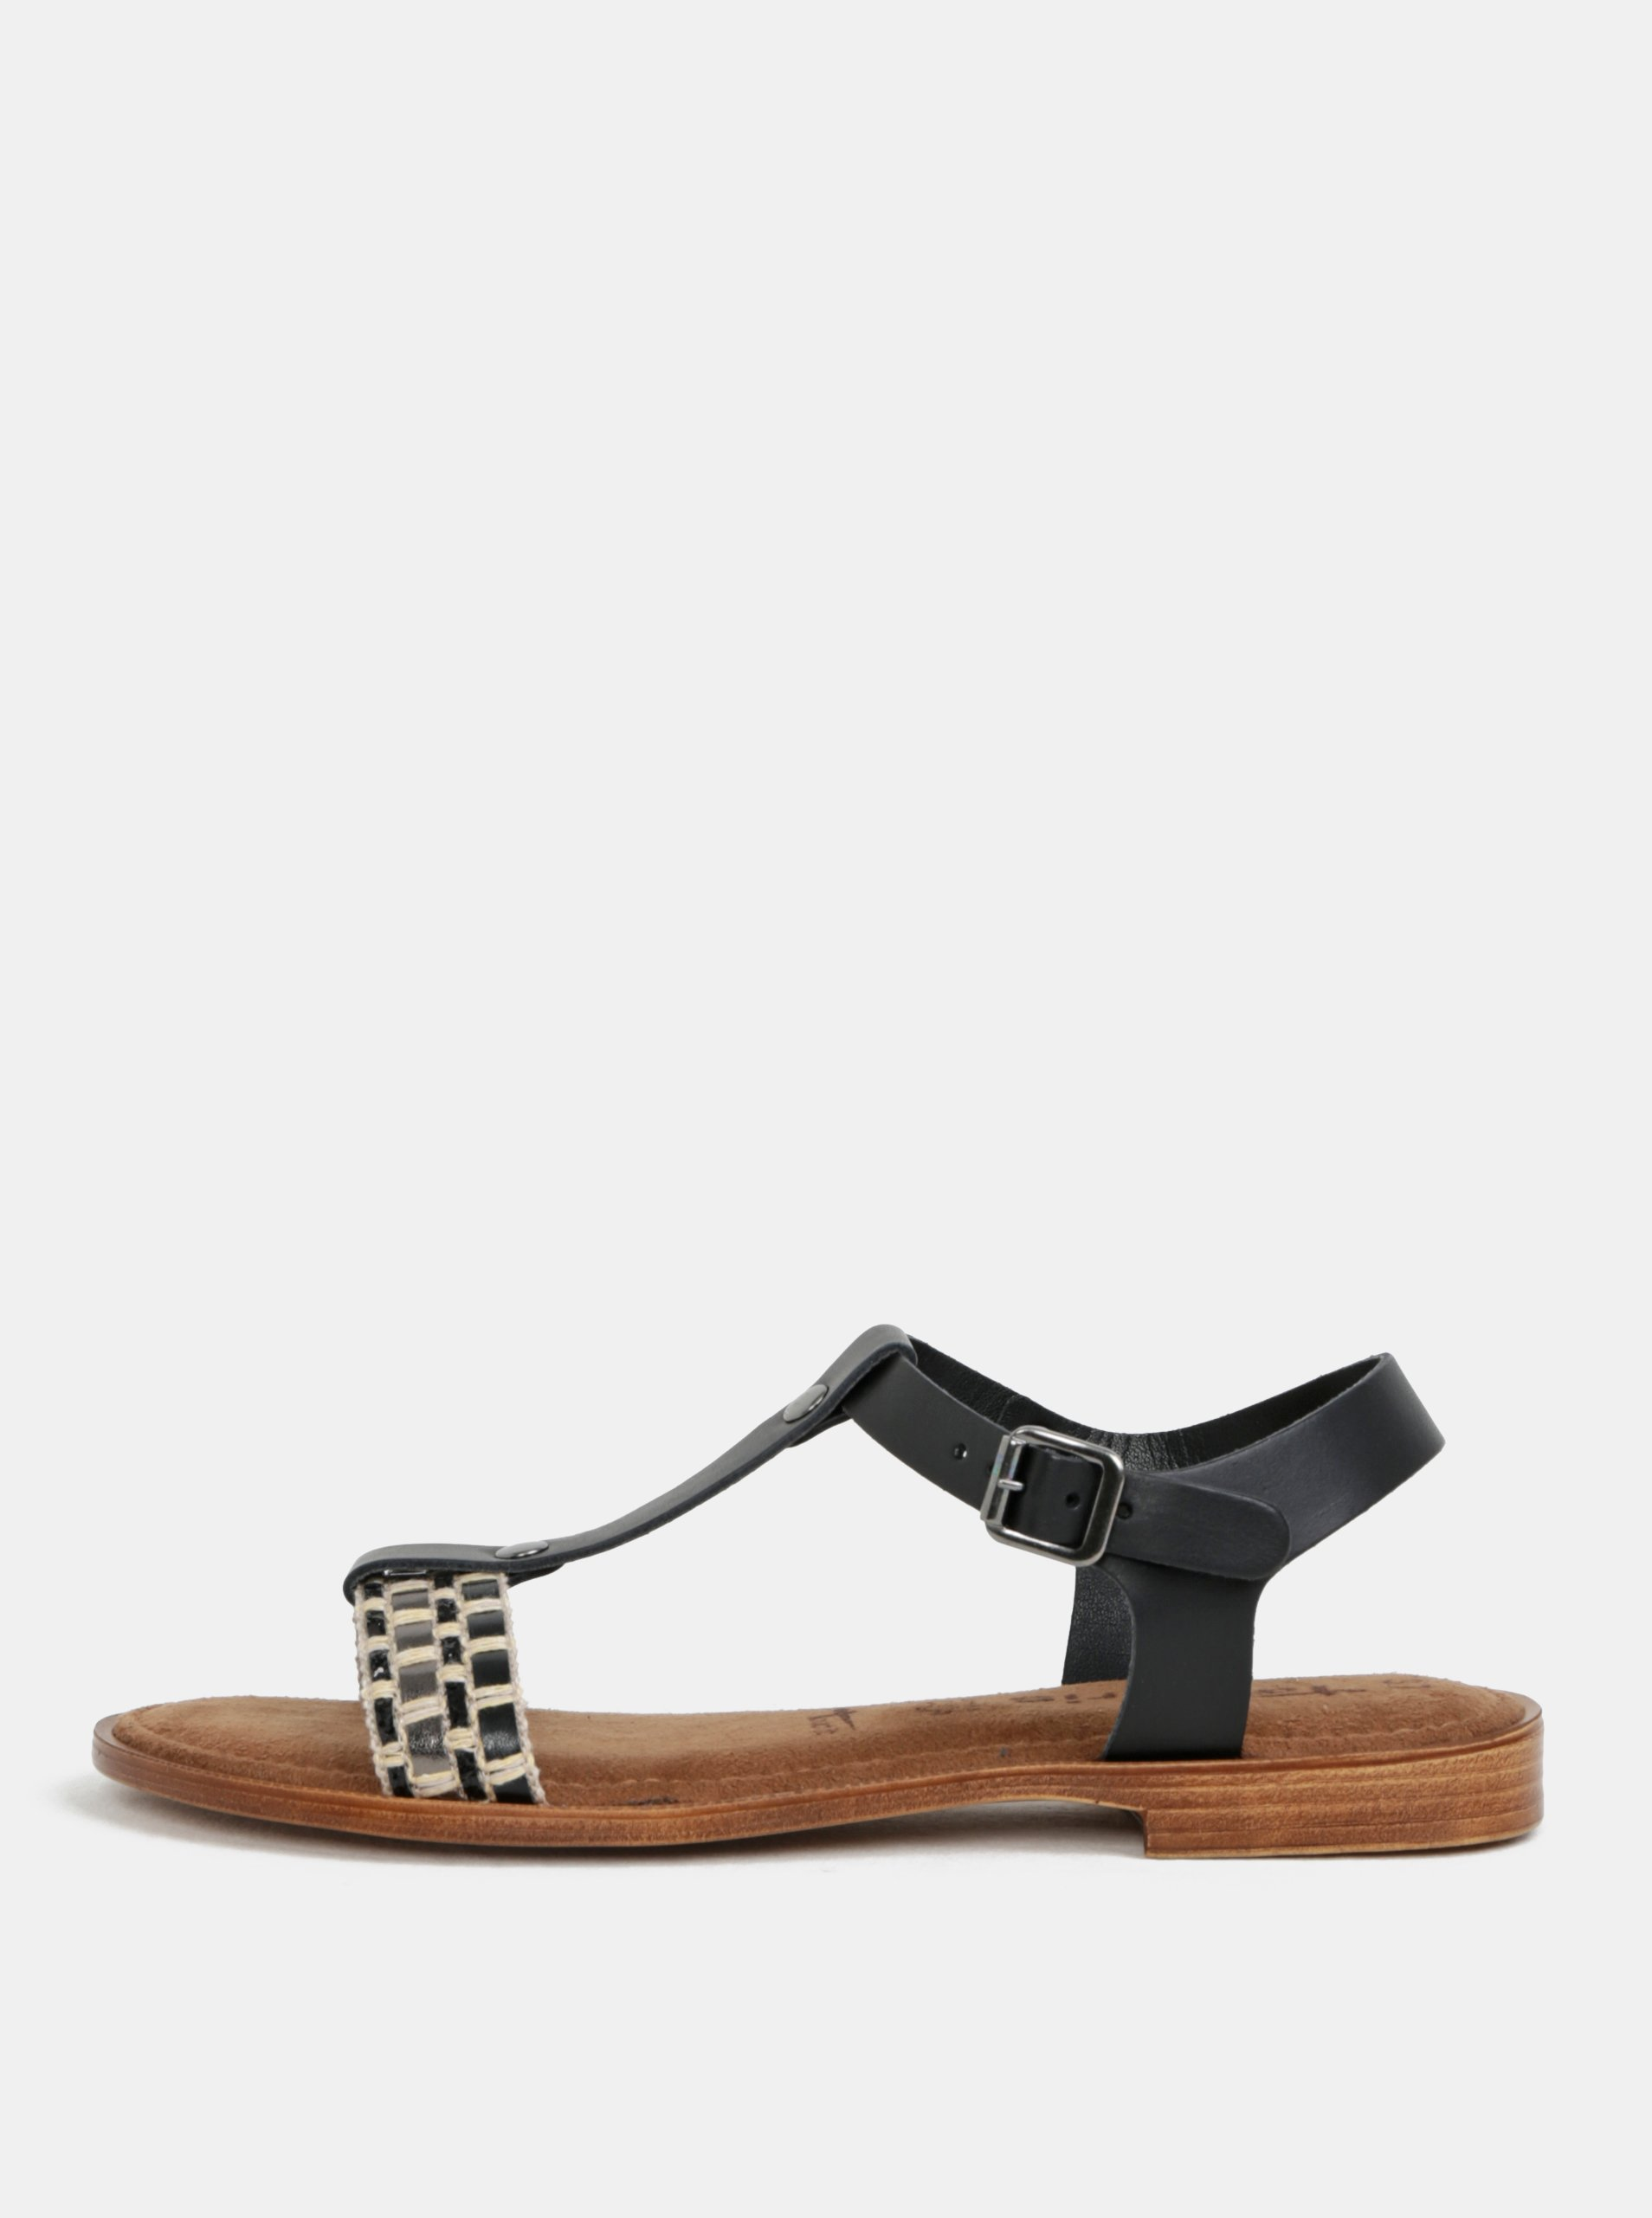 3da6302a650d Tamaris topanky cierne sandale damske